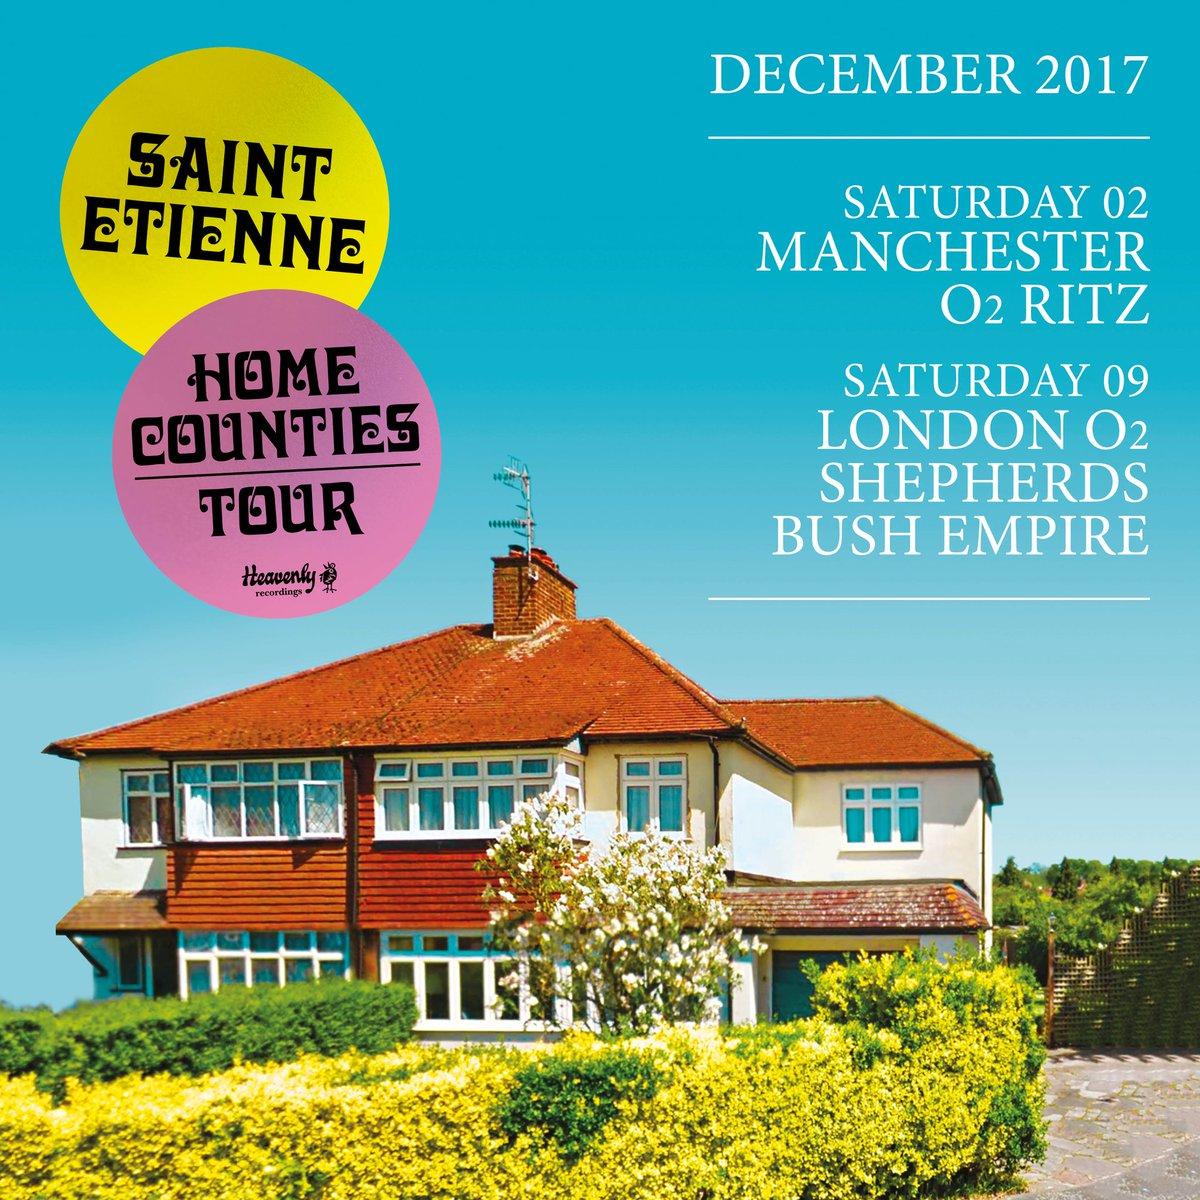 On sale now! #SaintEtienne (@bobpetesarah) have a show at #Manchester&#39;s @O2RitzManc in December! Tickets   http:// bit.ly/TLSaintEt  &nbsp;  <br>http://pic.twitter.com/hShOQFi4LJ